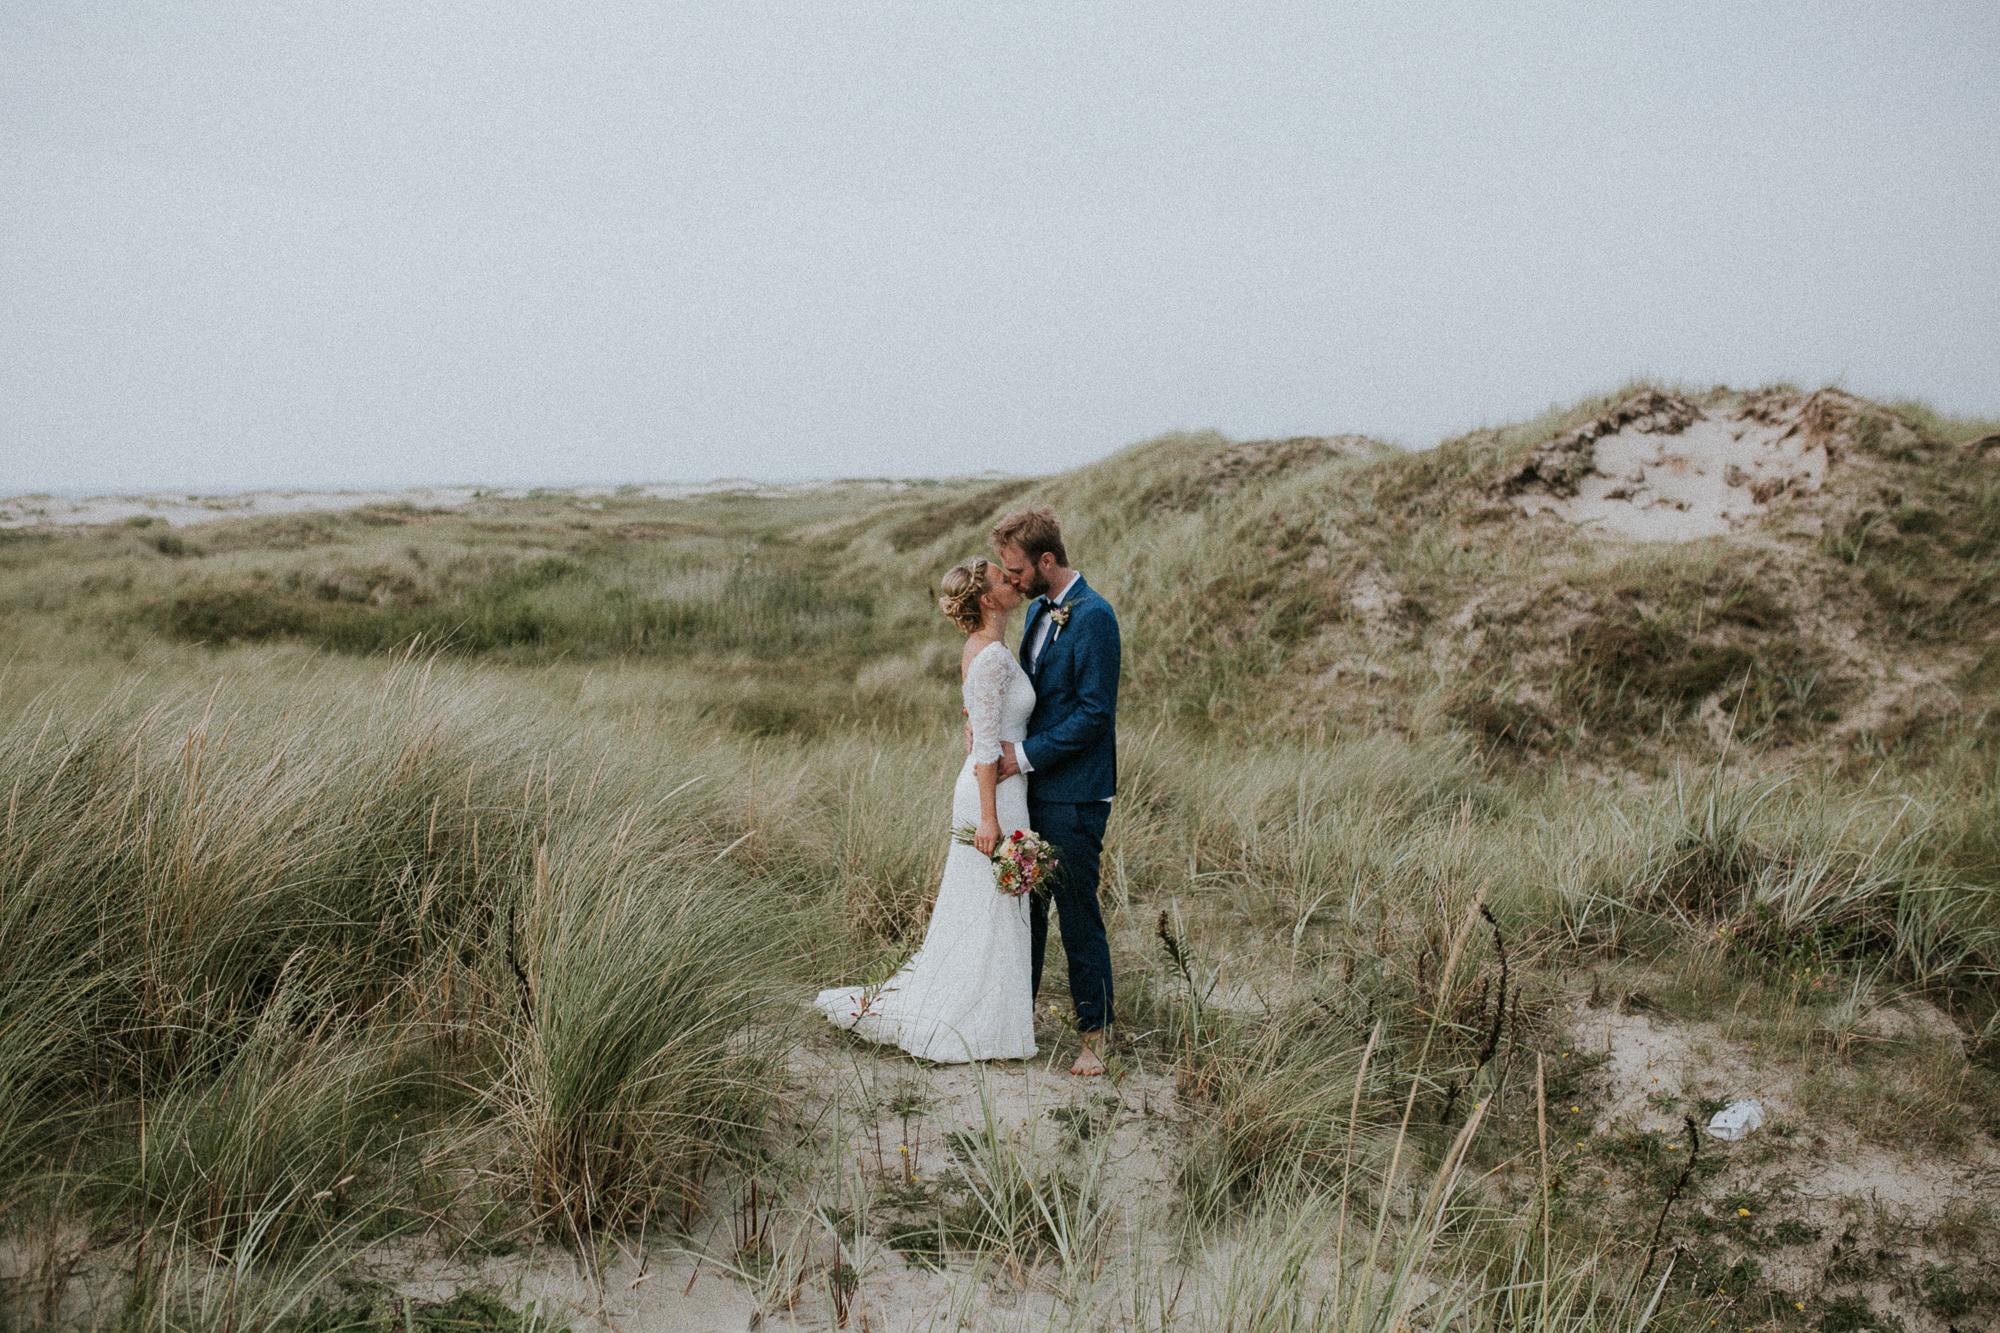 Hochzeitsfotograf Sankt Peter-Ording | Alina Atzler